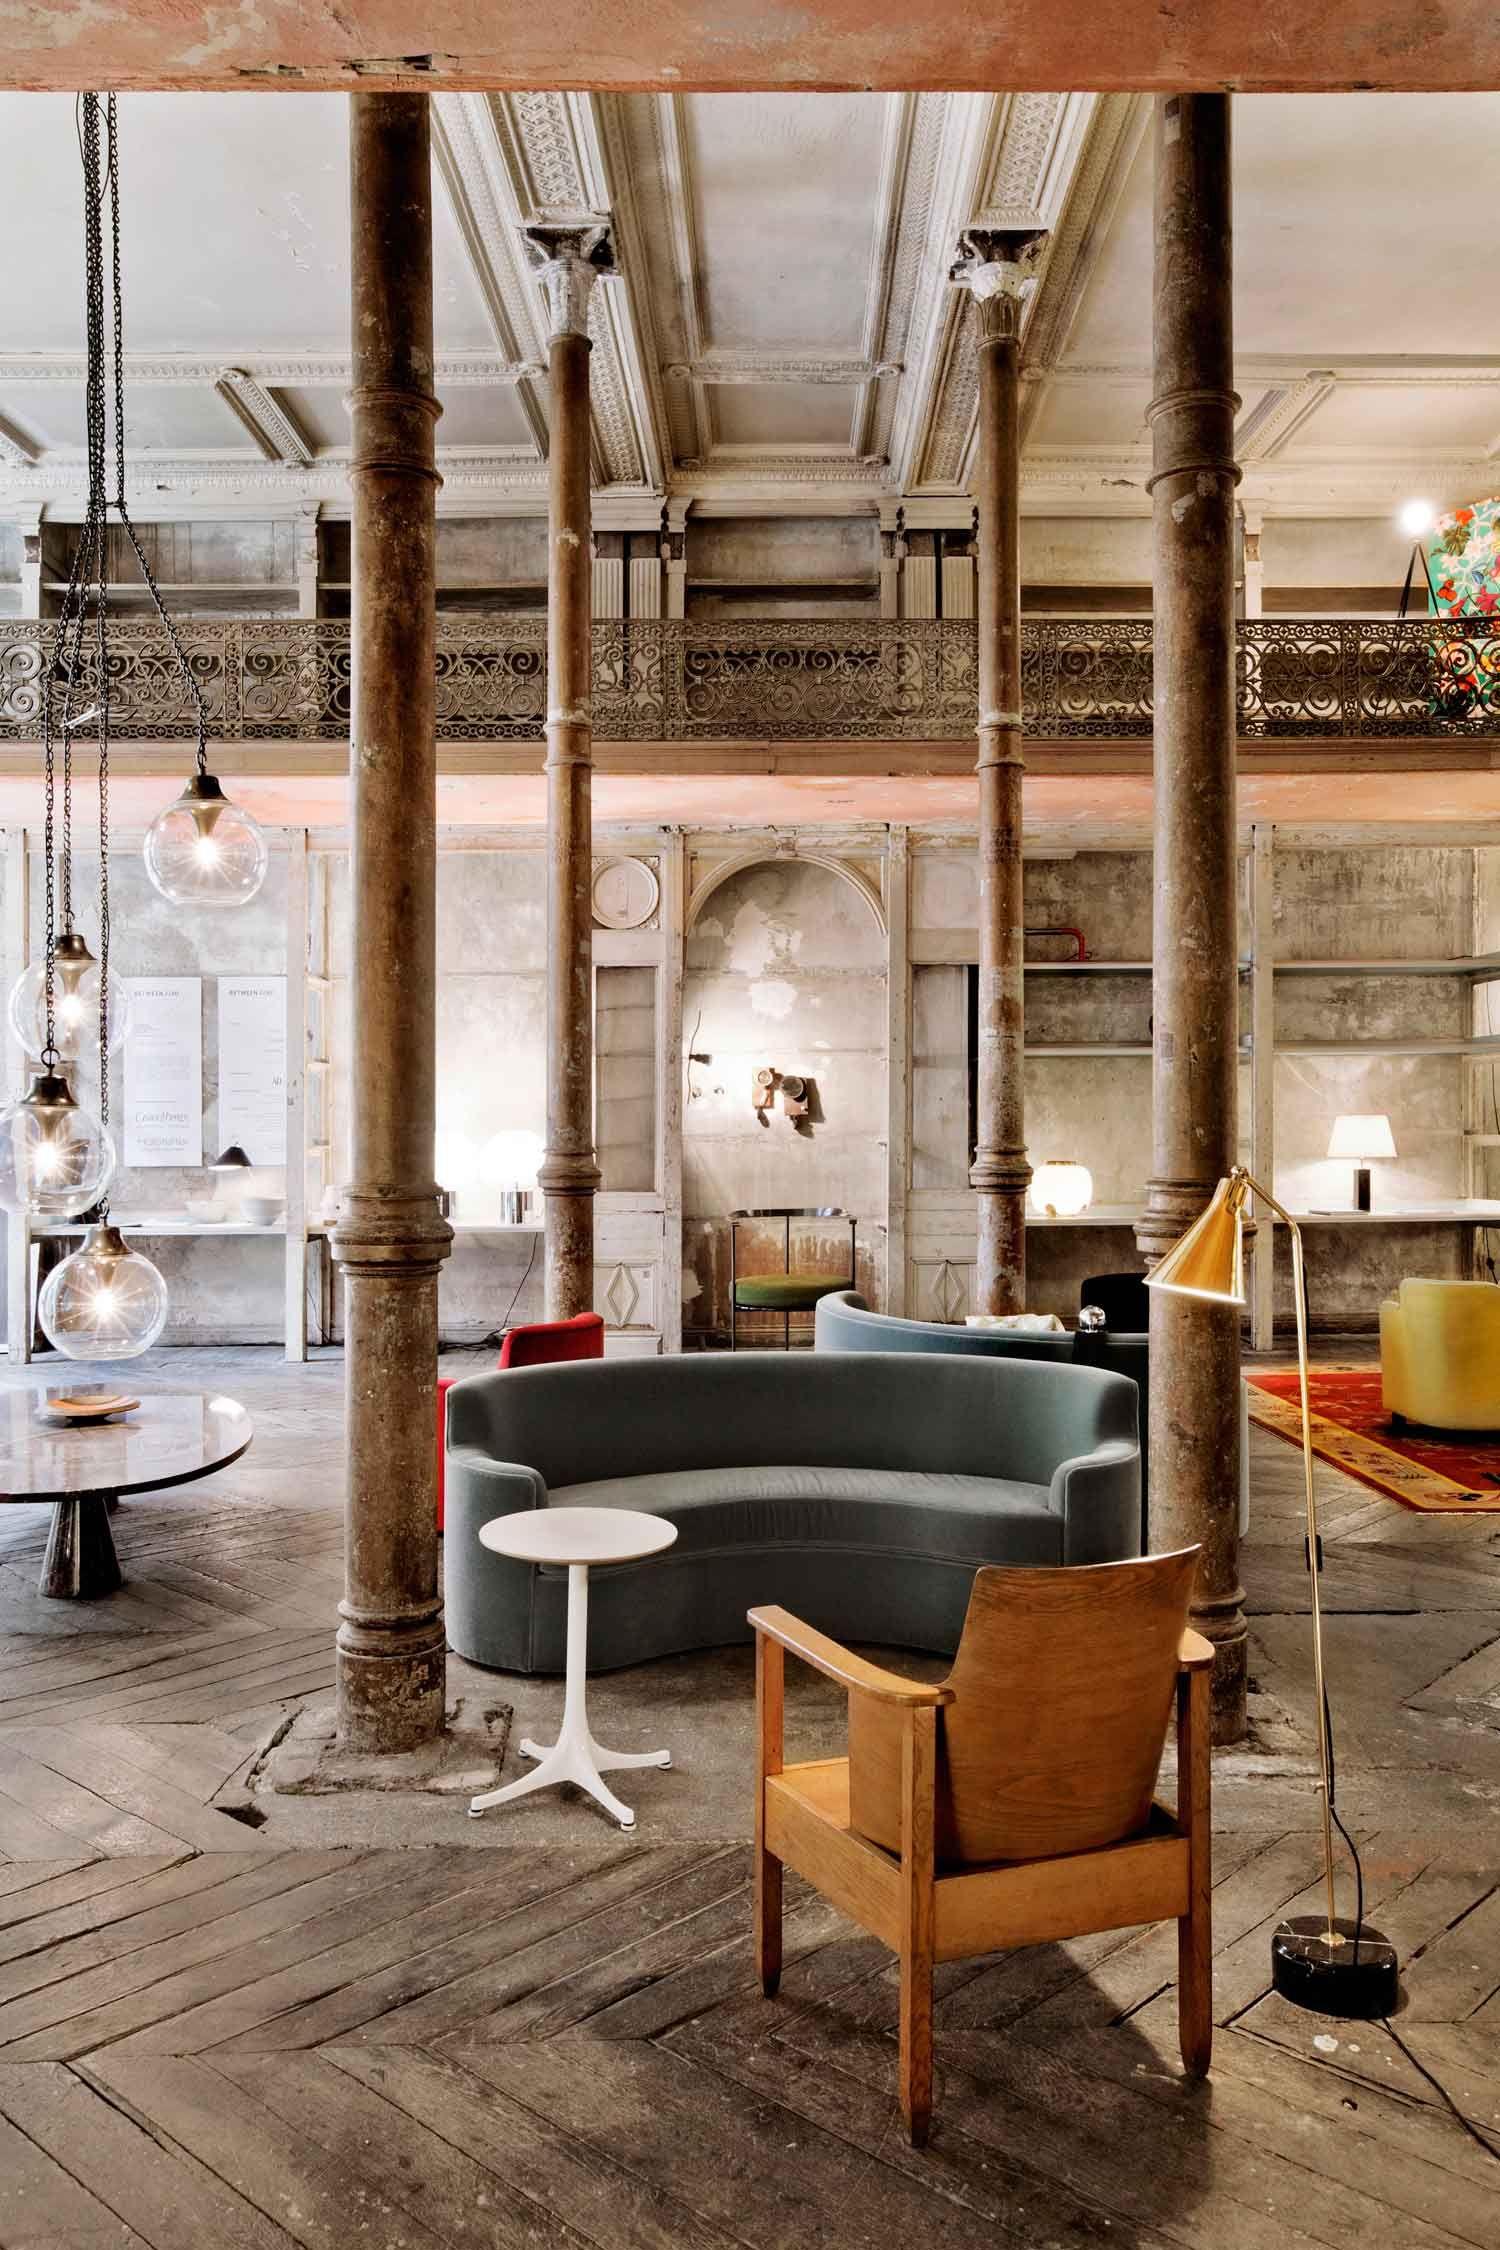 Summer House Interior Design Ideas From Berlin: Berlin-based Gisbert Pöppler Combines Architecture, Interior Design And Custom Designed